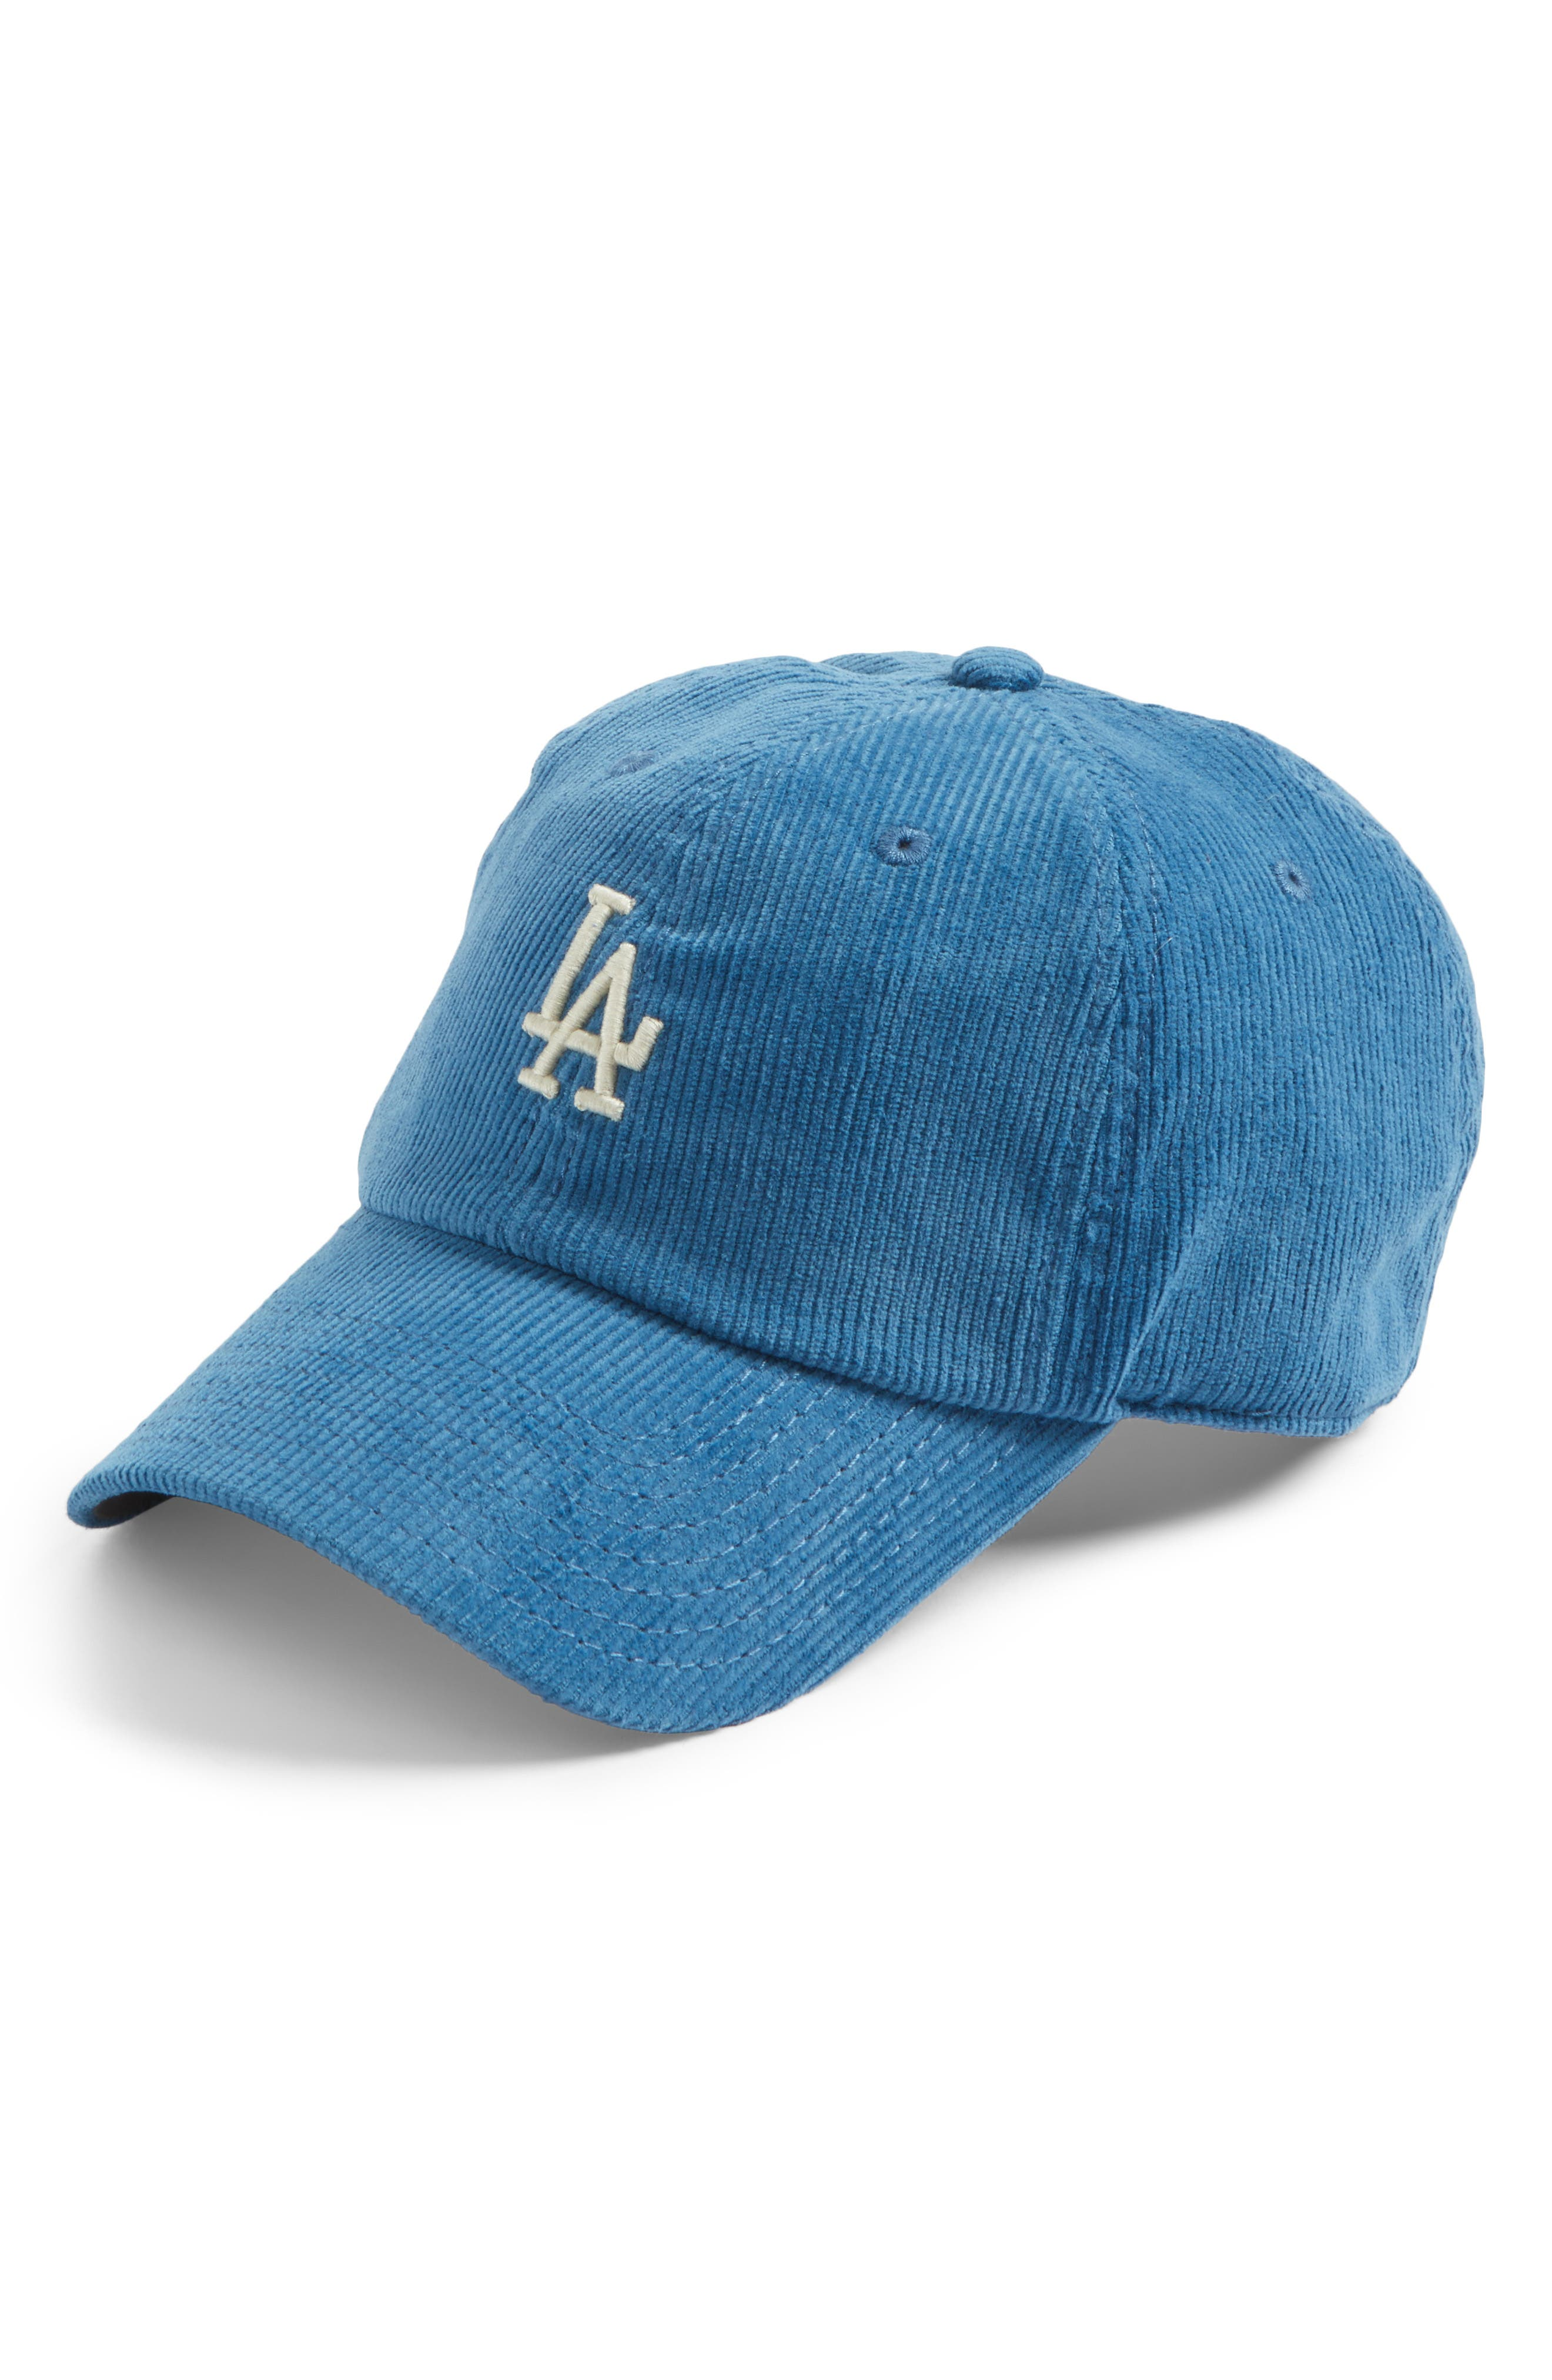 Main Image - American Needle Corduroy Baseball Cap